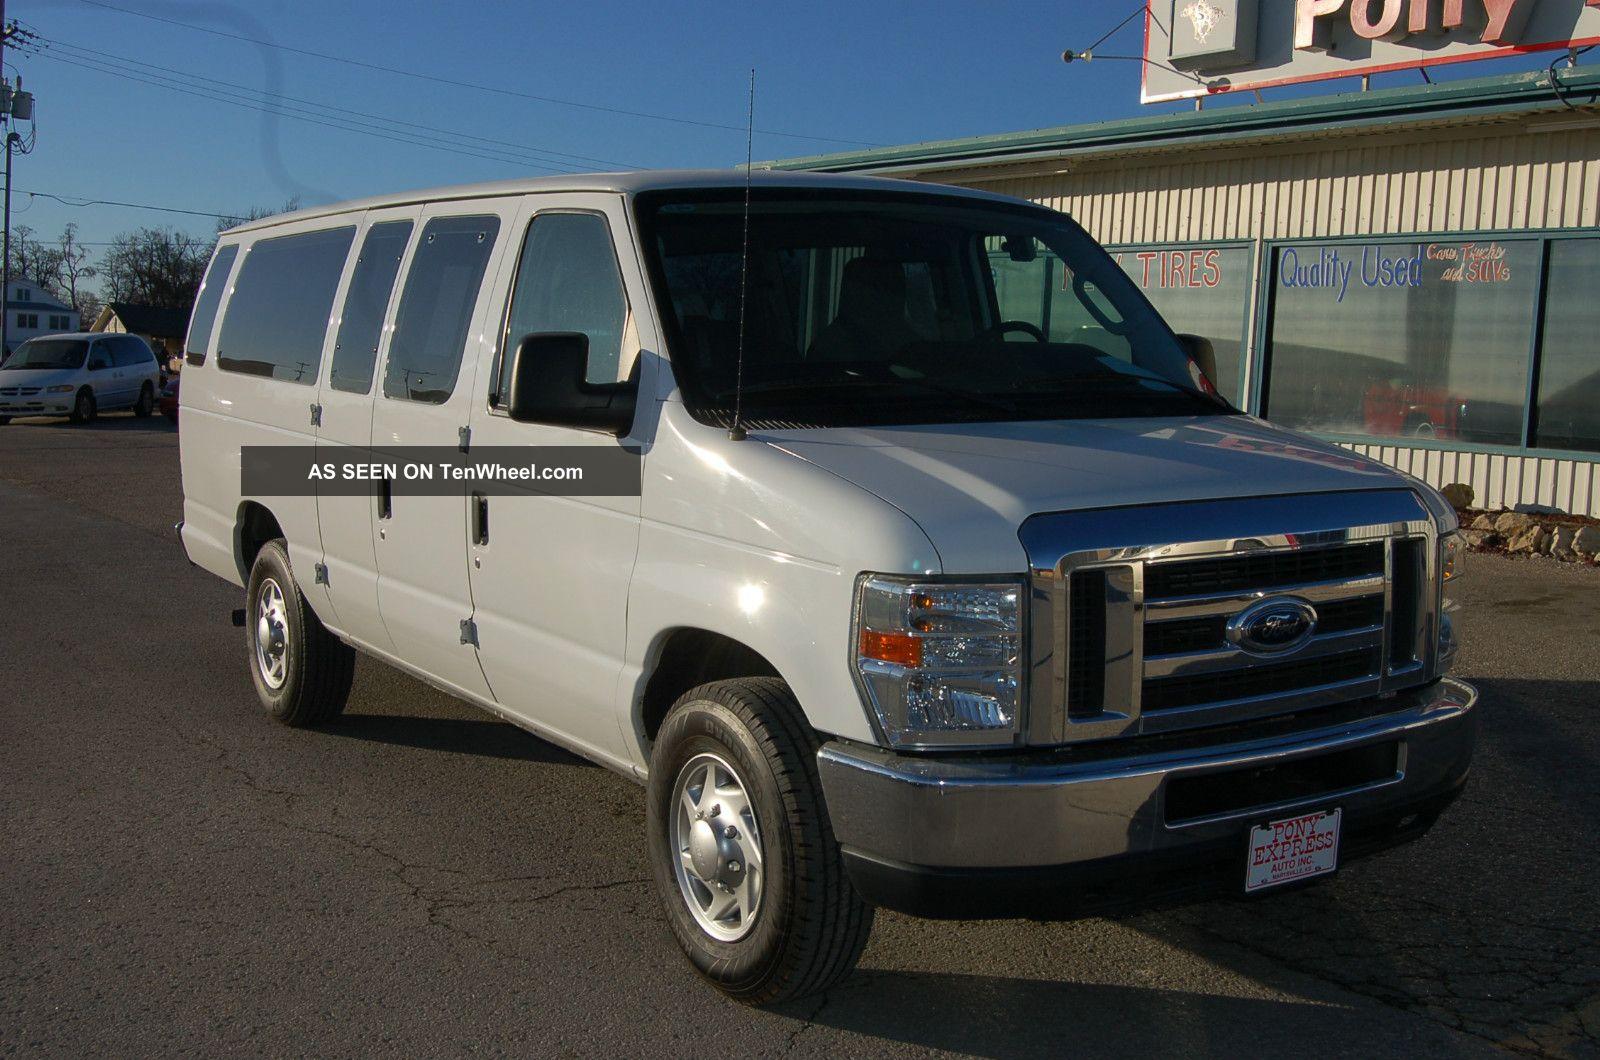 2010 Ford E350 Xlt Sd Ext Wagon Xlt 15 - Passenger Van E-Series Van photo